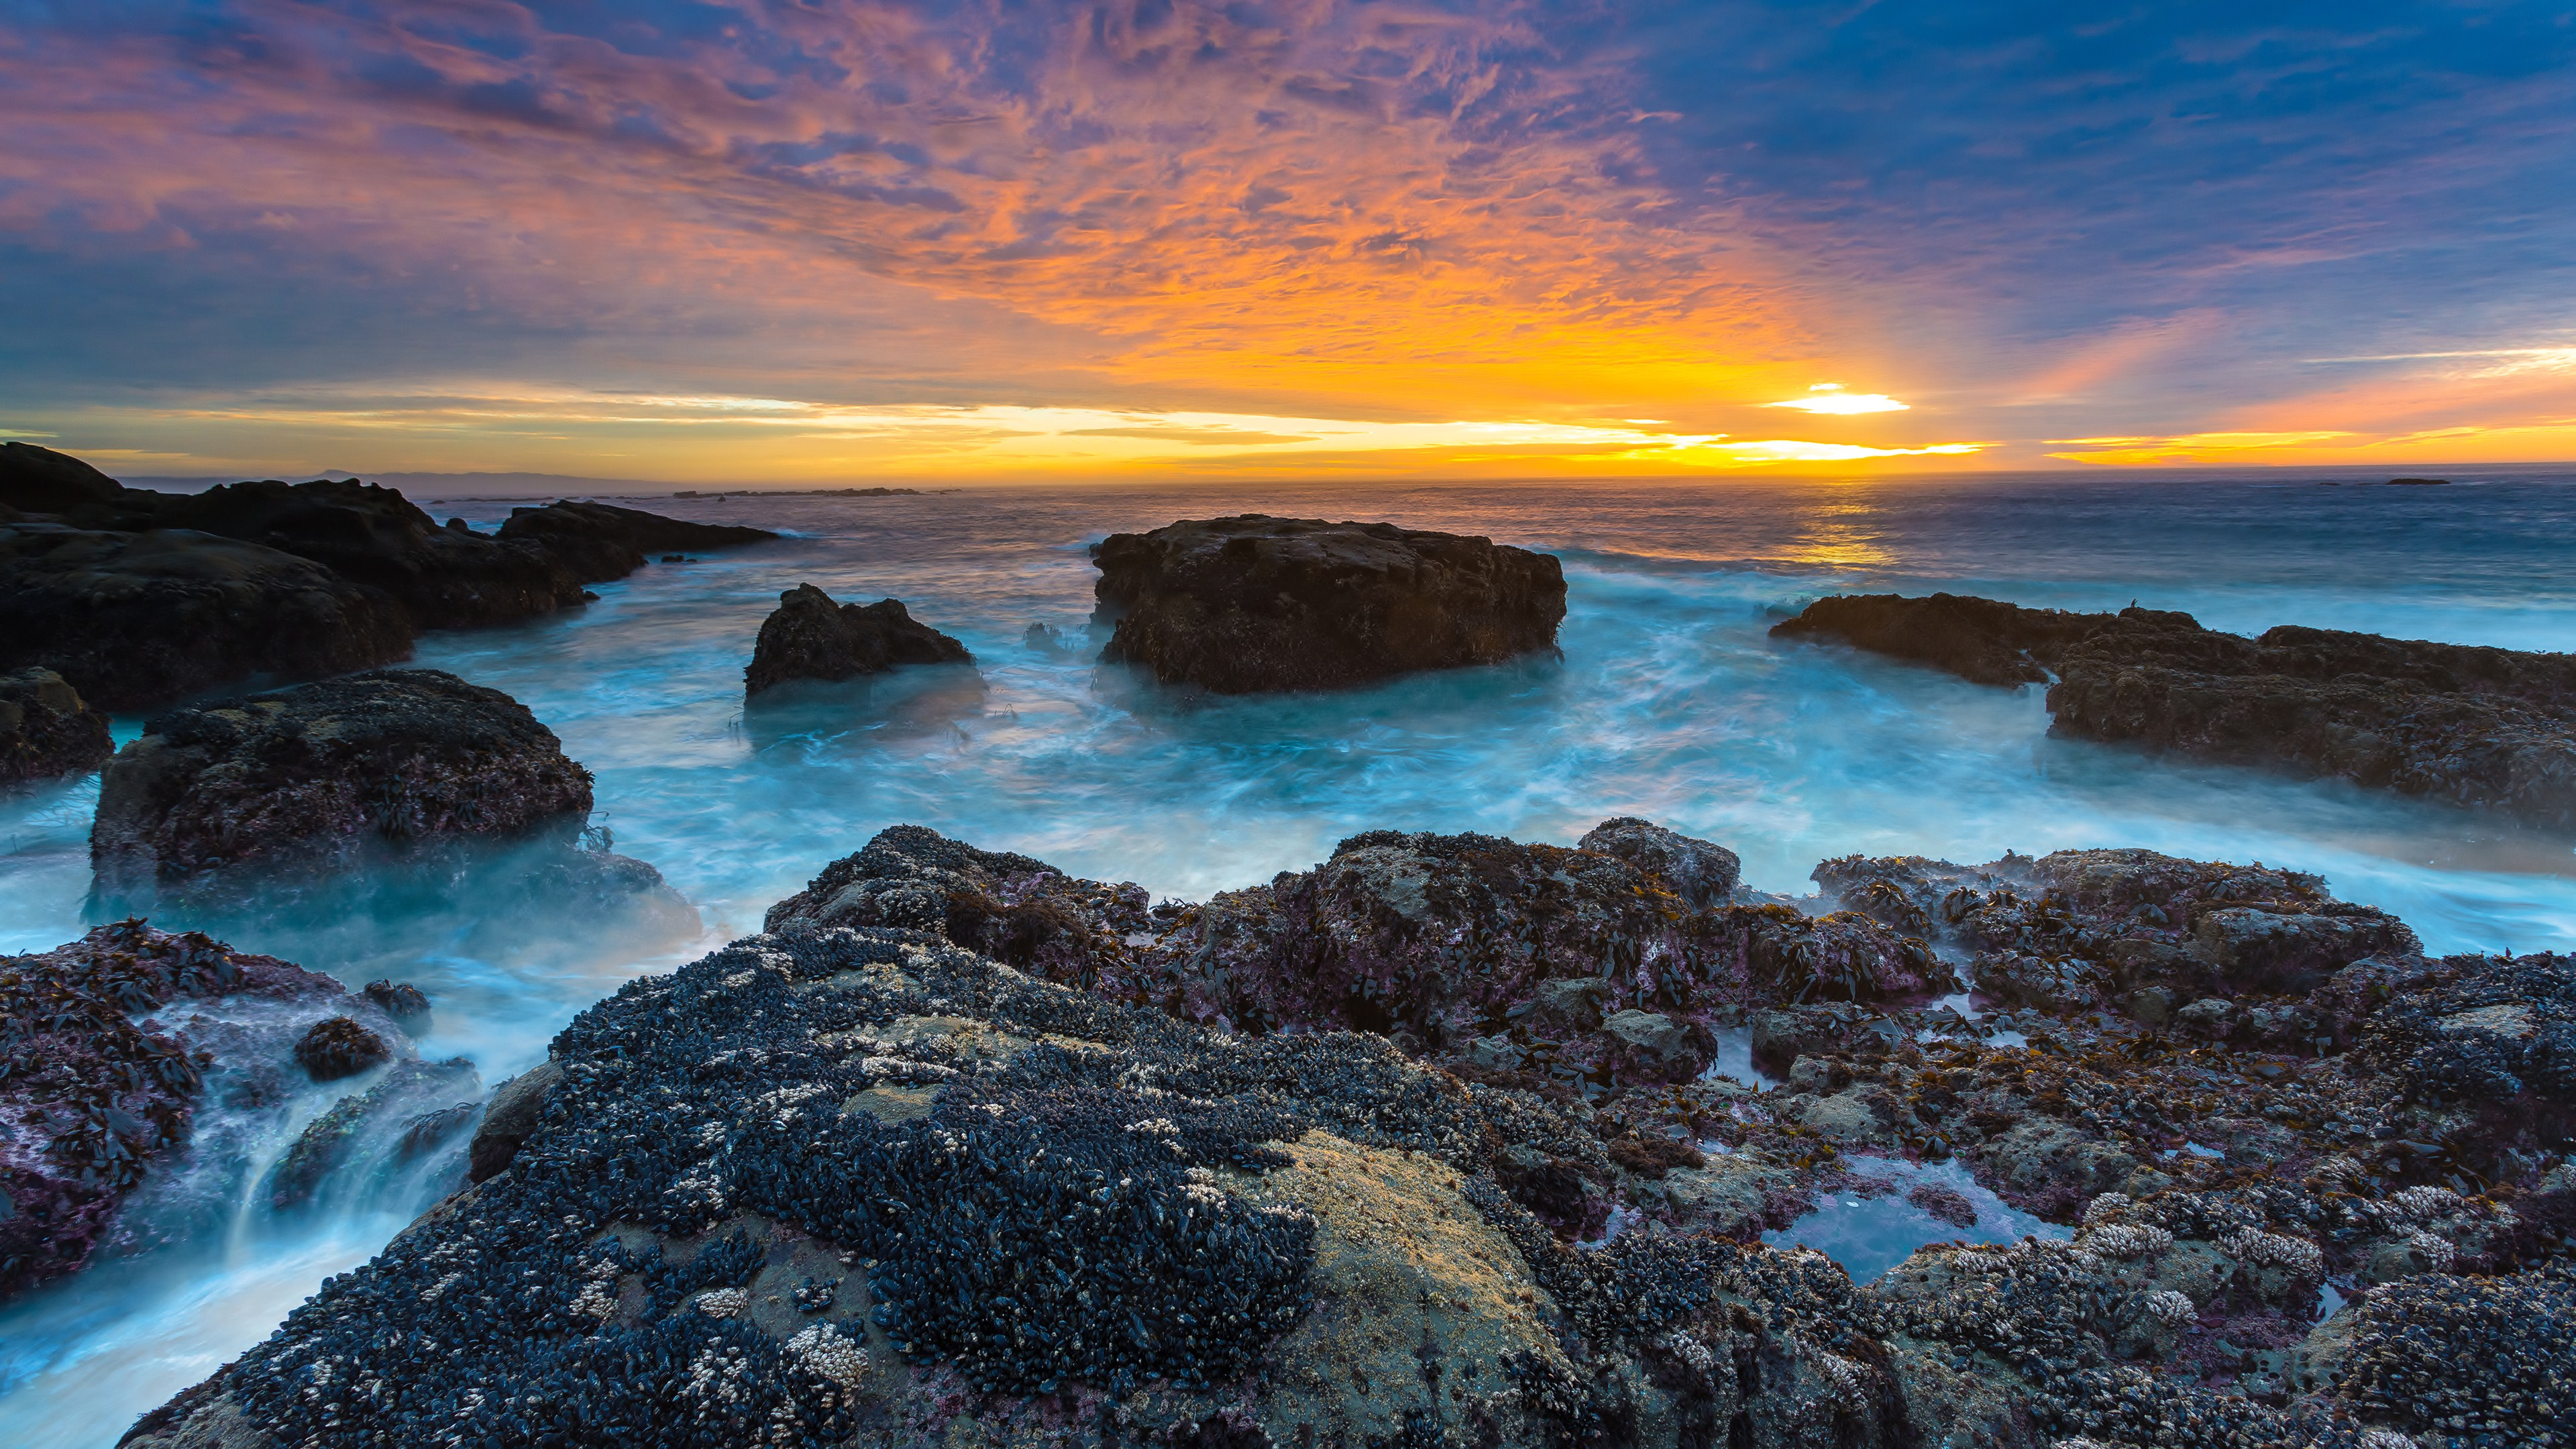 lake sunset landscape ocean ultrahd 4k wallpaper wallpaper background 3840x2160